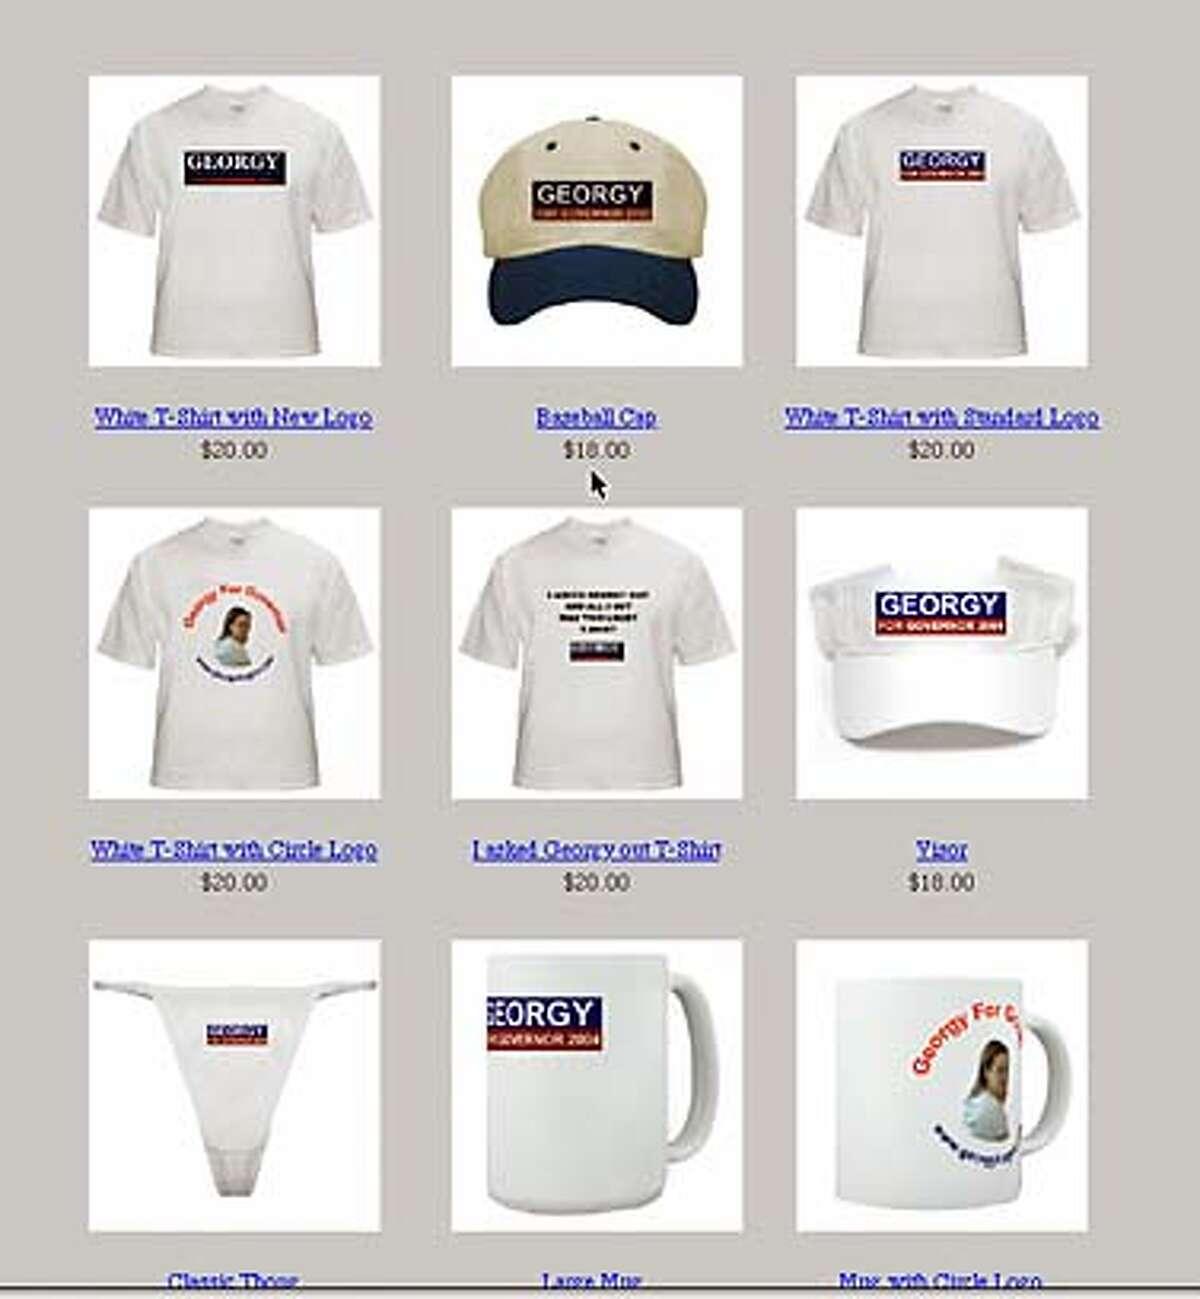 georgy for gov.com merchandise